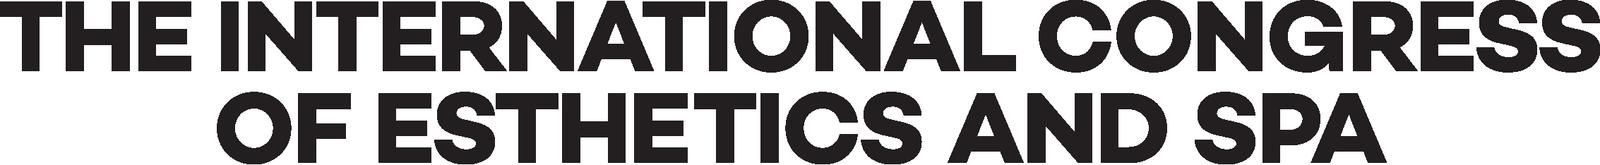 International Congress of Esthetics and Spa Philadelphia 2018